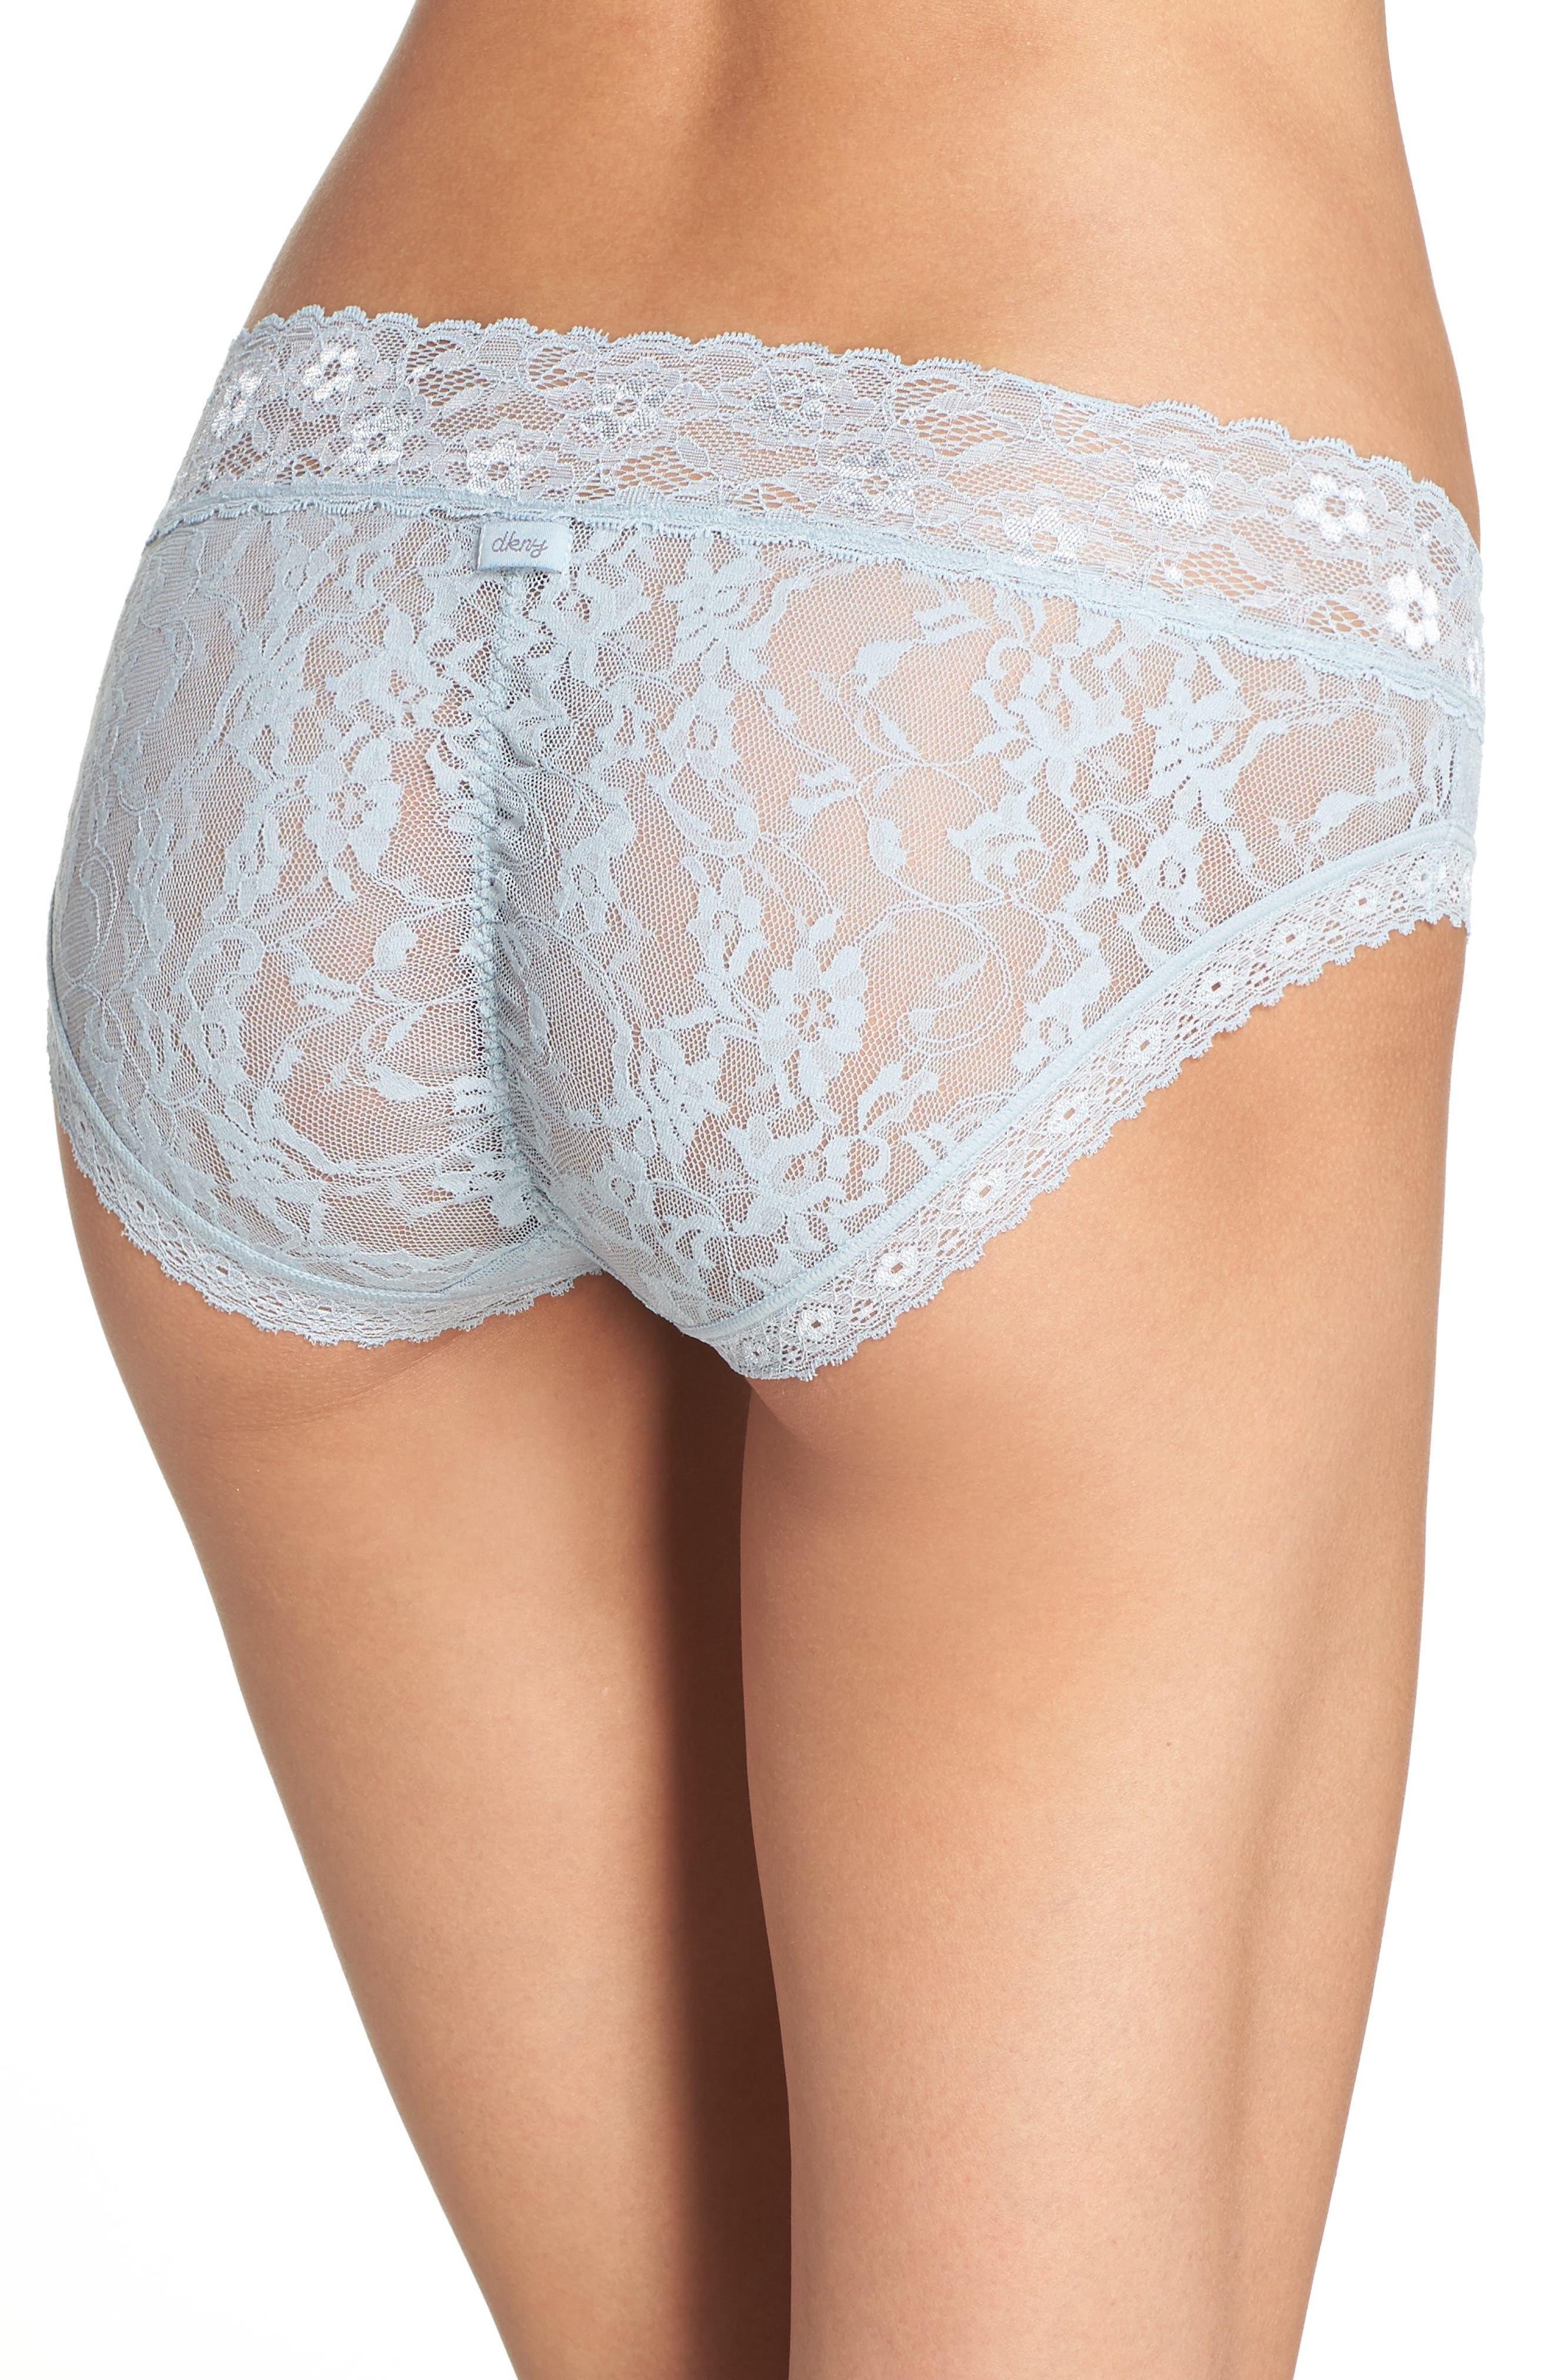 Alternate Image 2  - DKNY 'Signature Lace' Bikini (3 for $30)